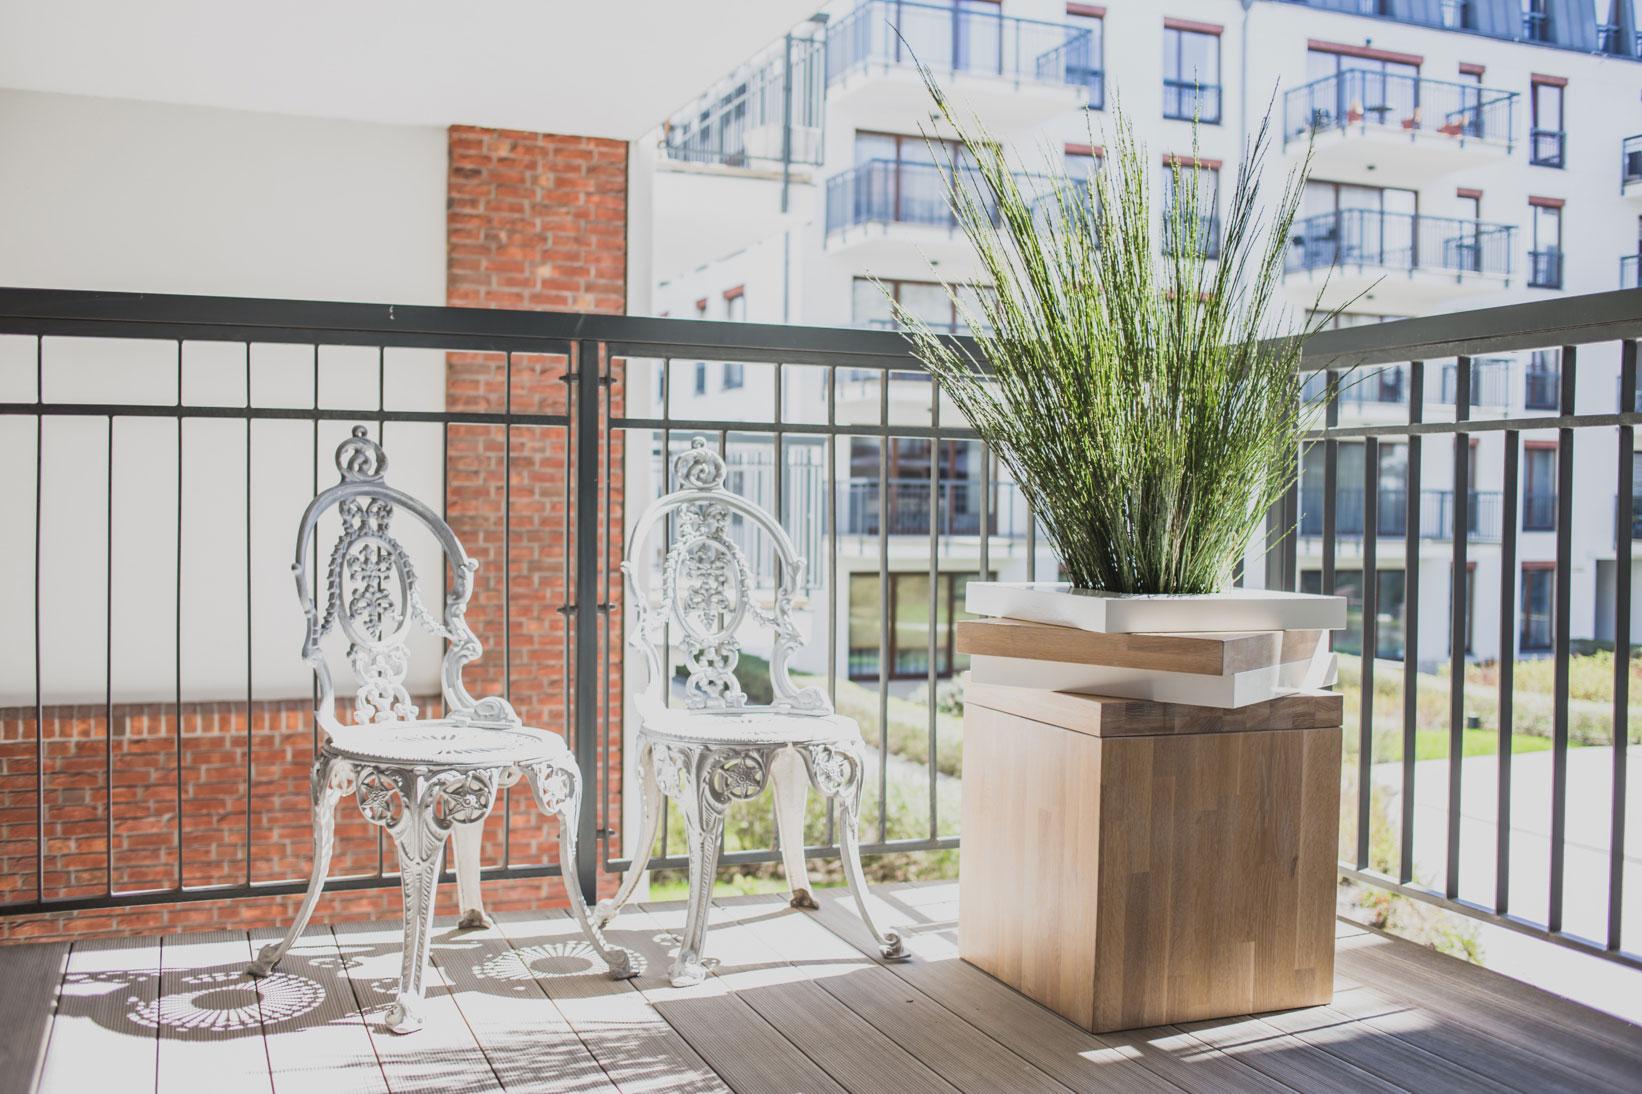 Szafarnia 2 Compact Apartment by Raca Architekci-01